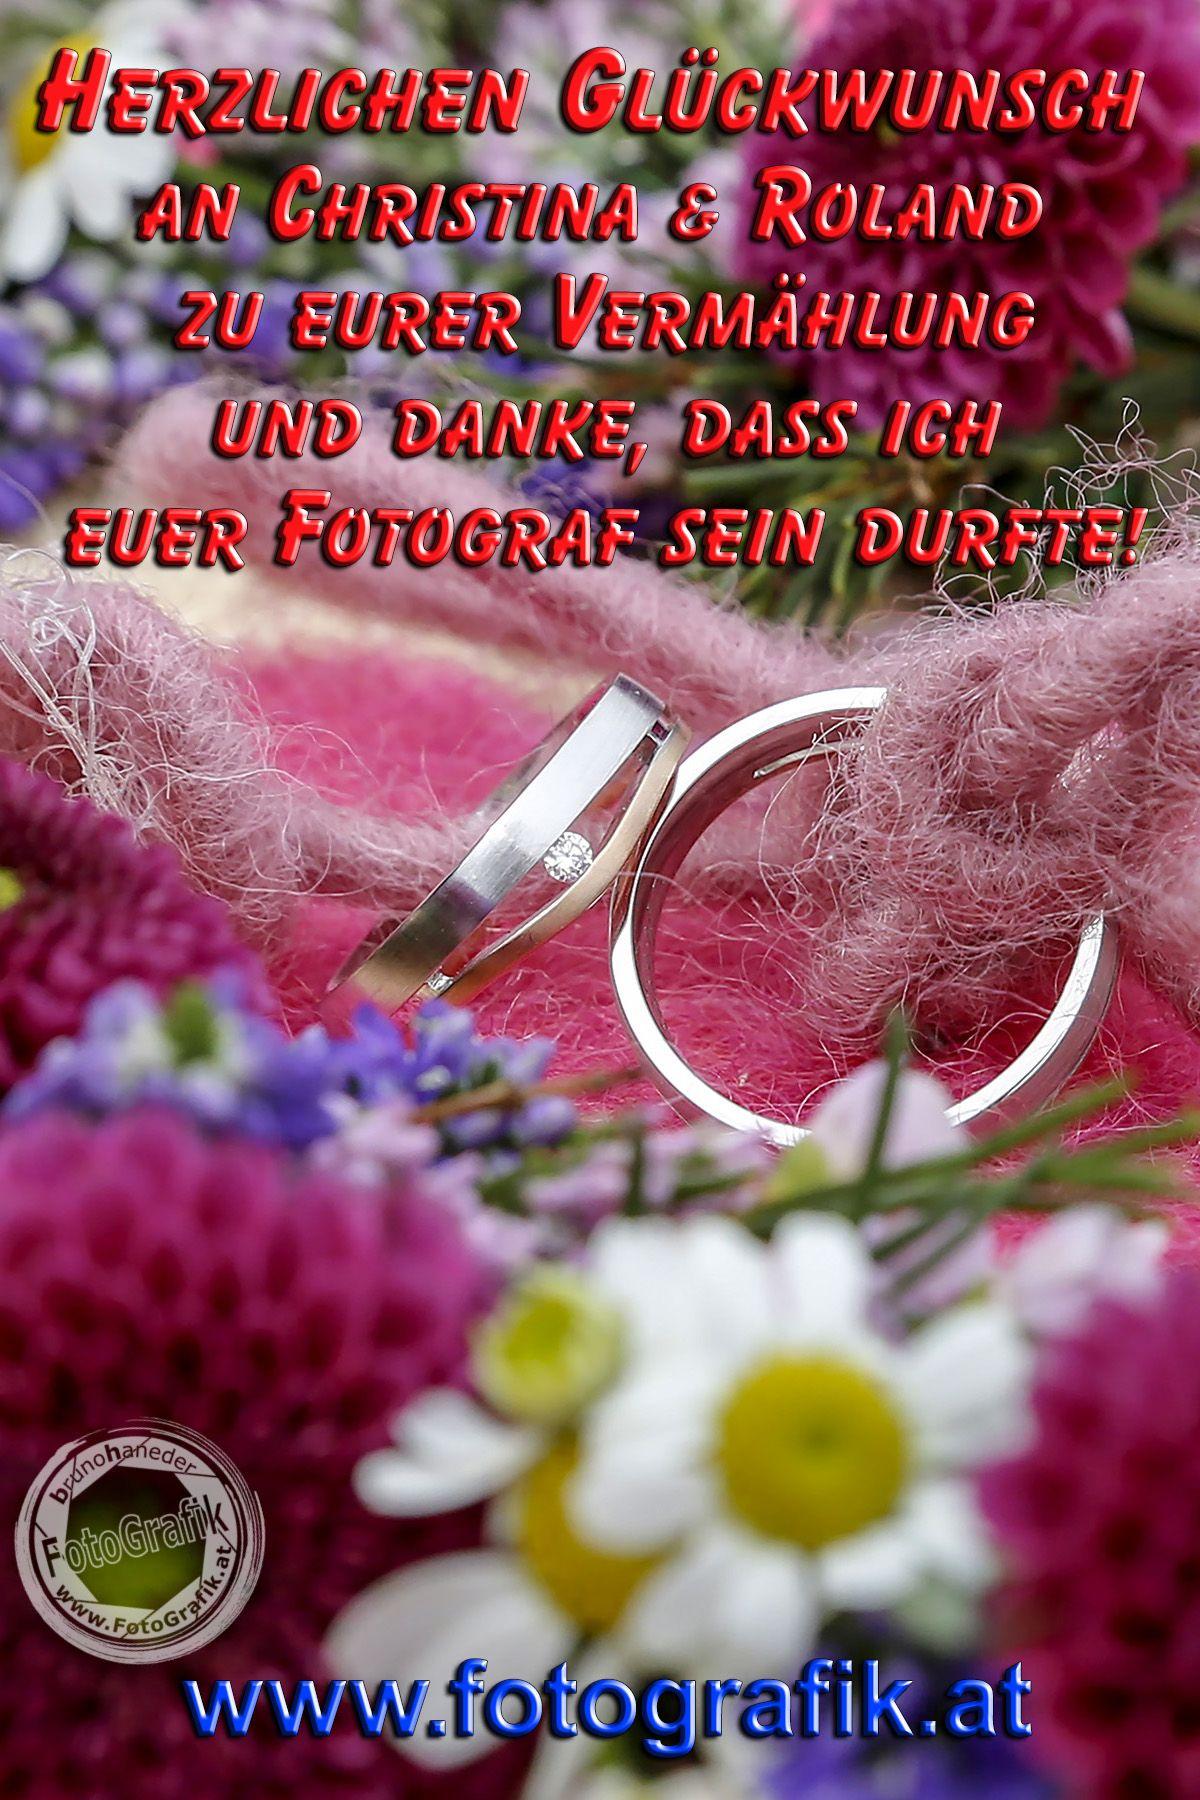 Herzlichen Glückwunsch An Christina Roland Zu Eurer